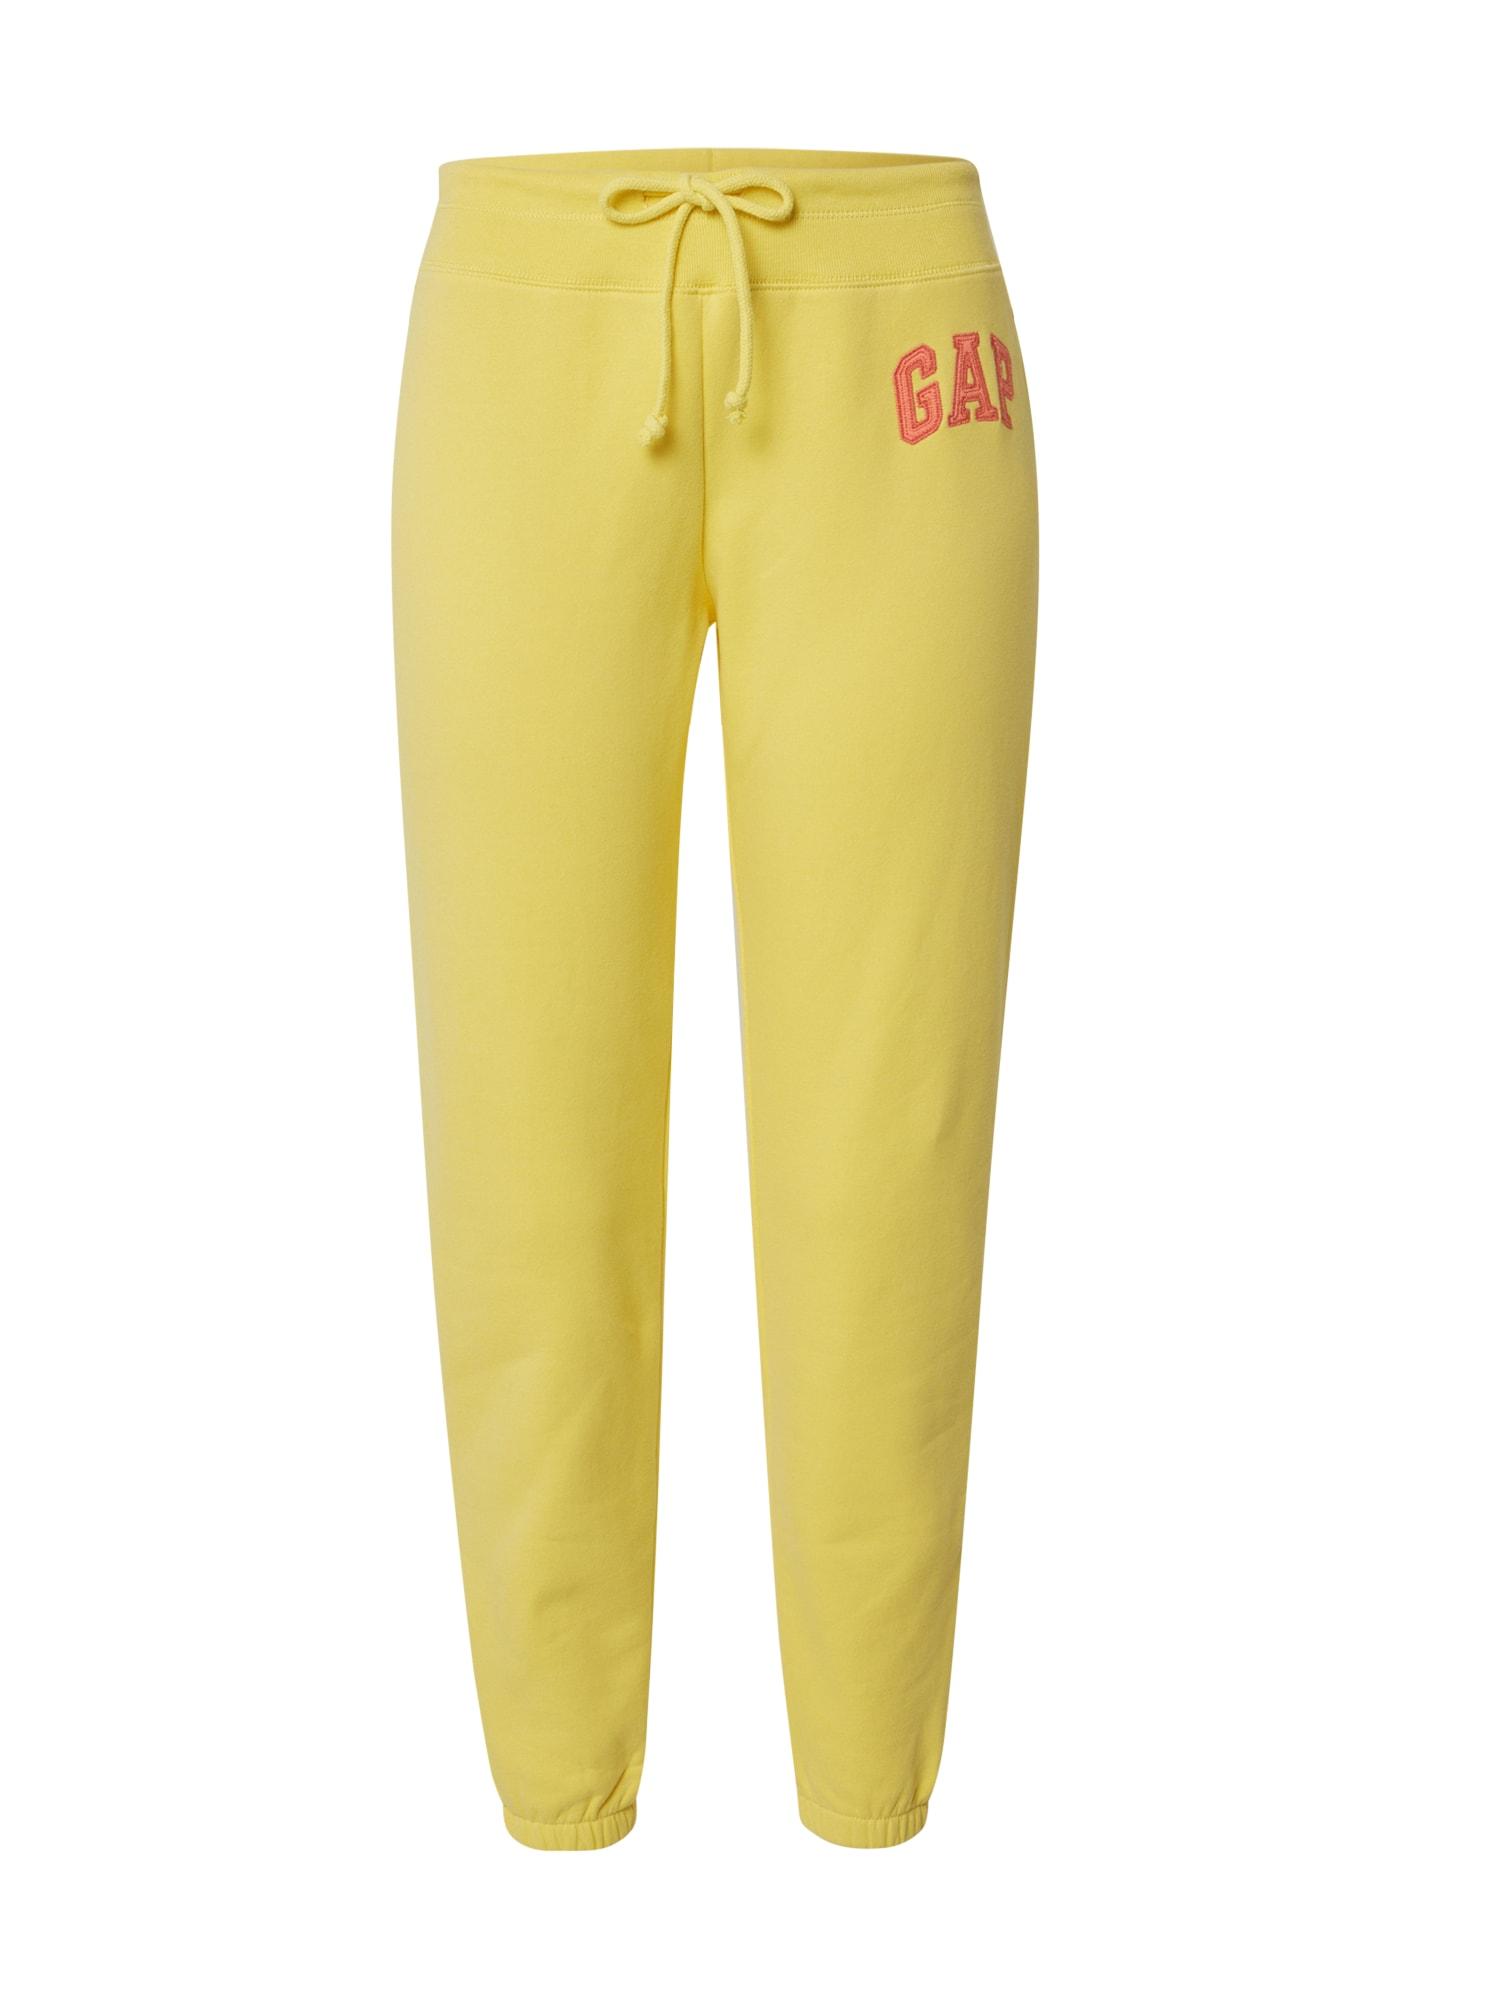 GAP Kelnės 'FASH' geltona